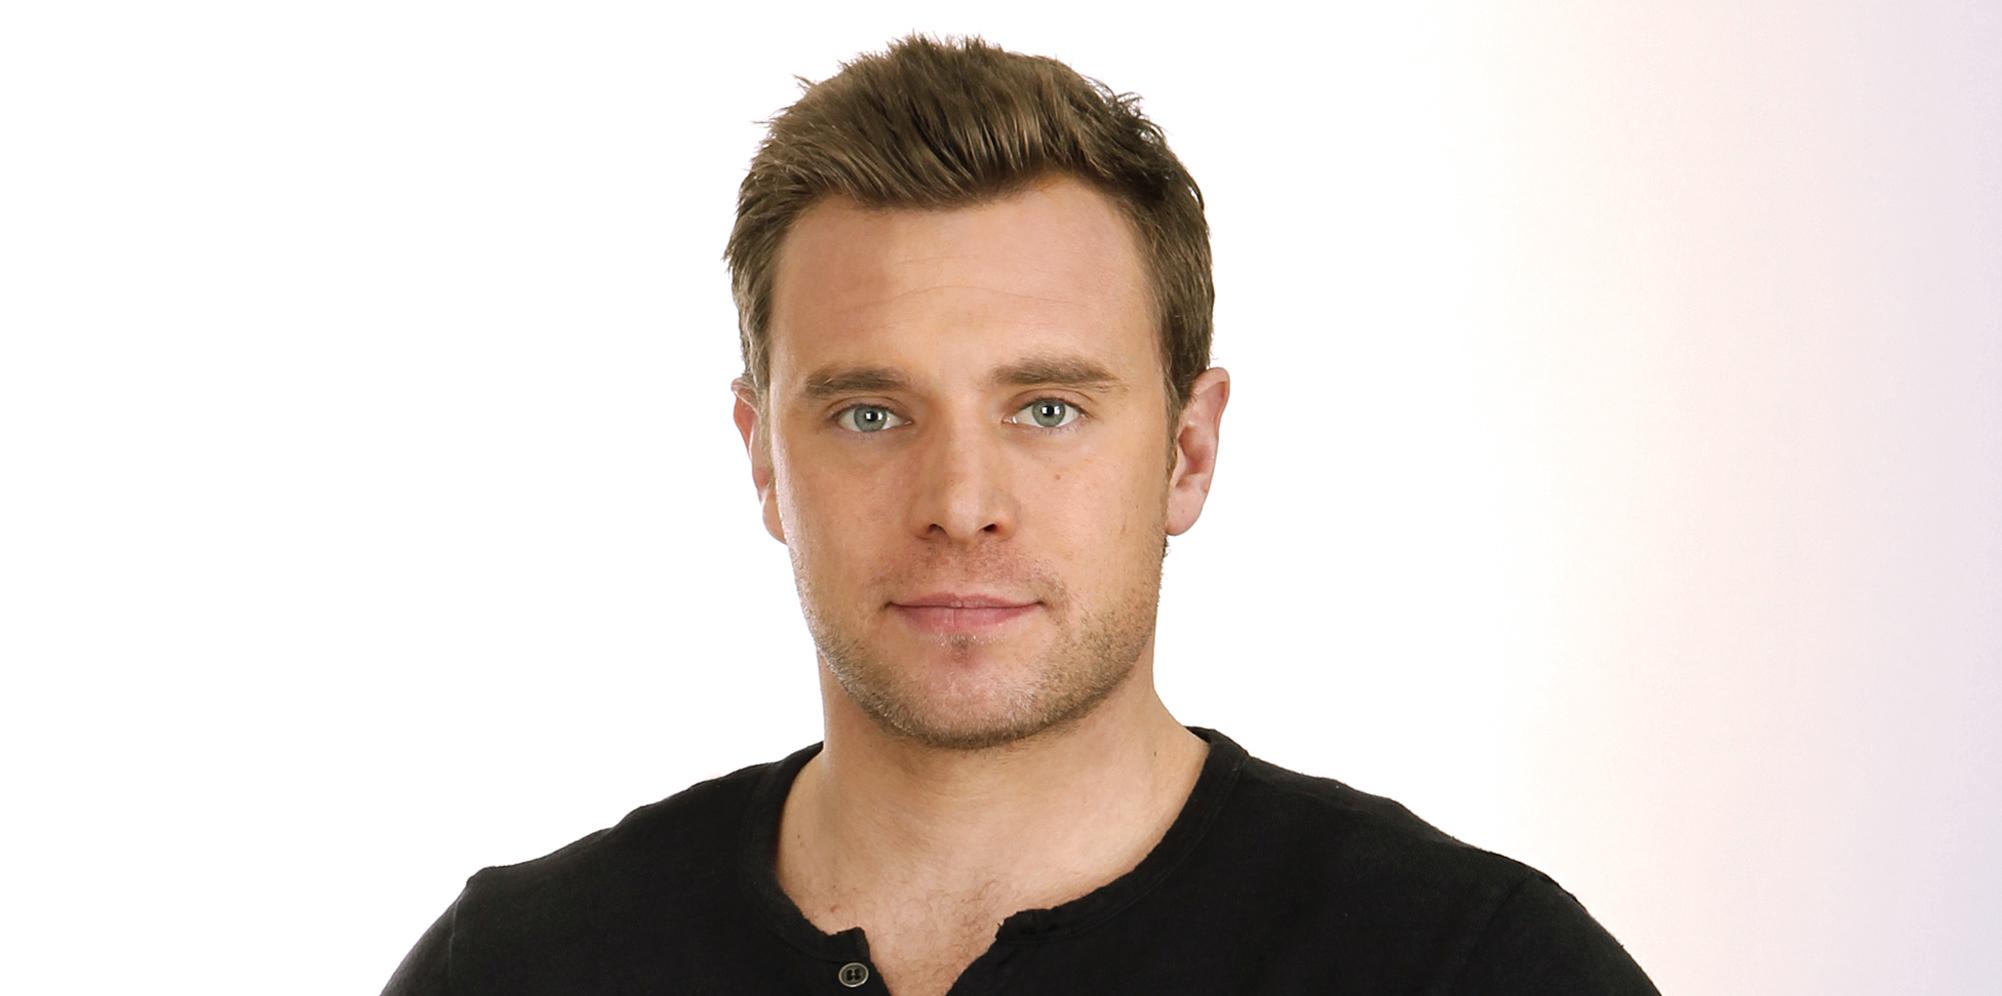 Billy miller actor dating